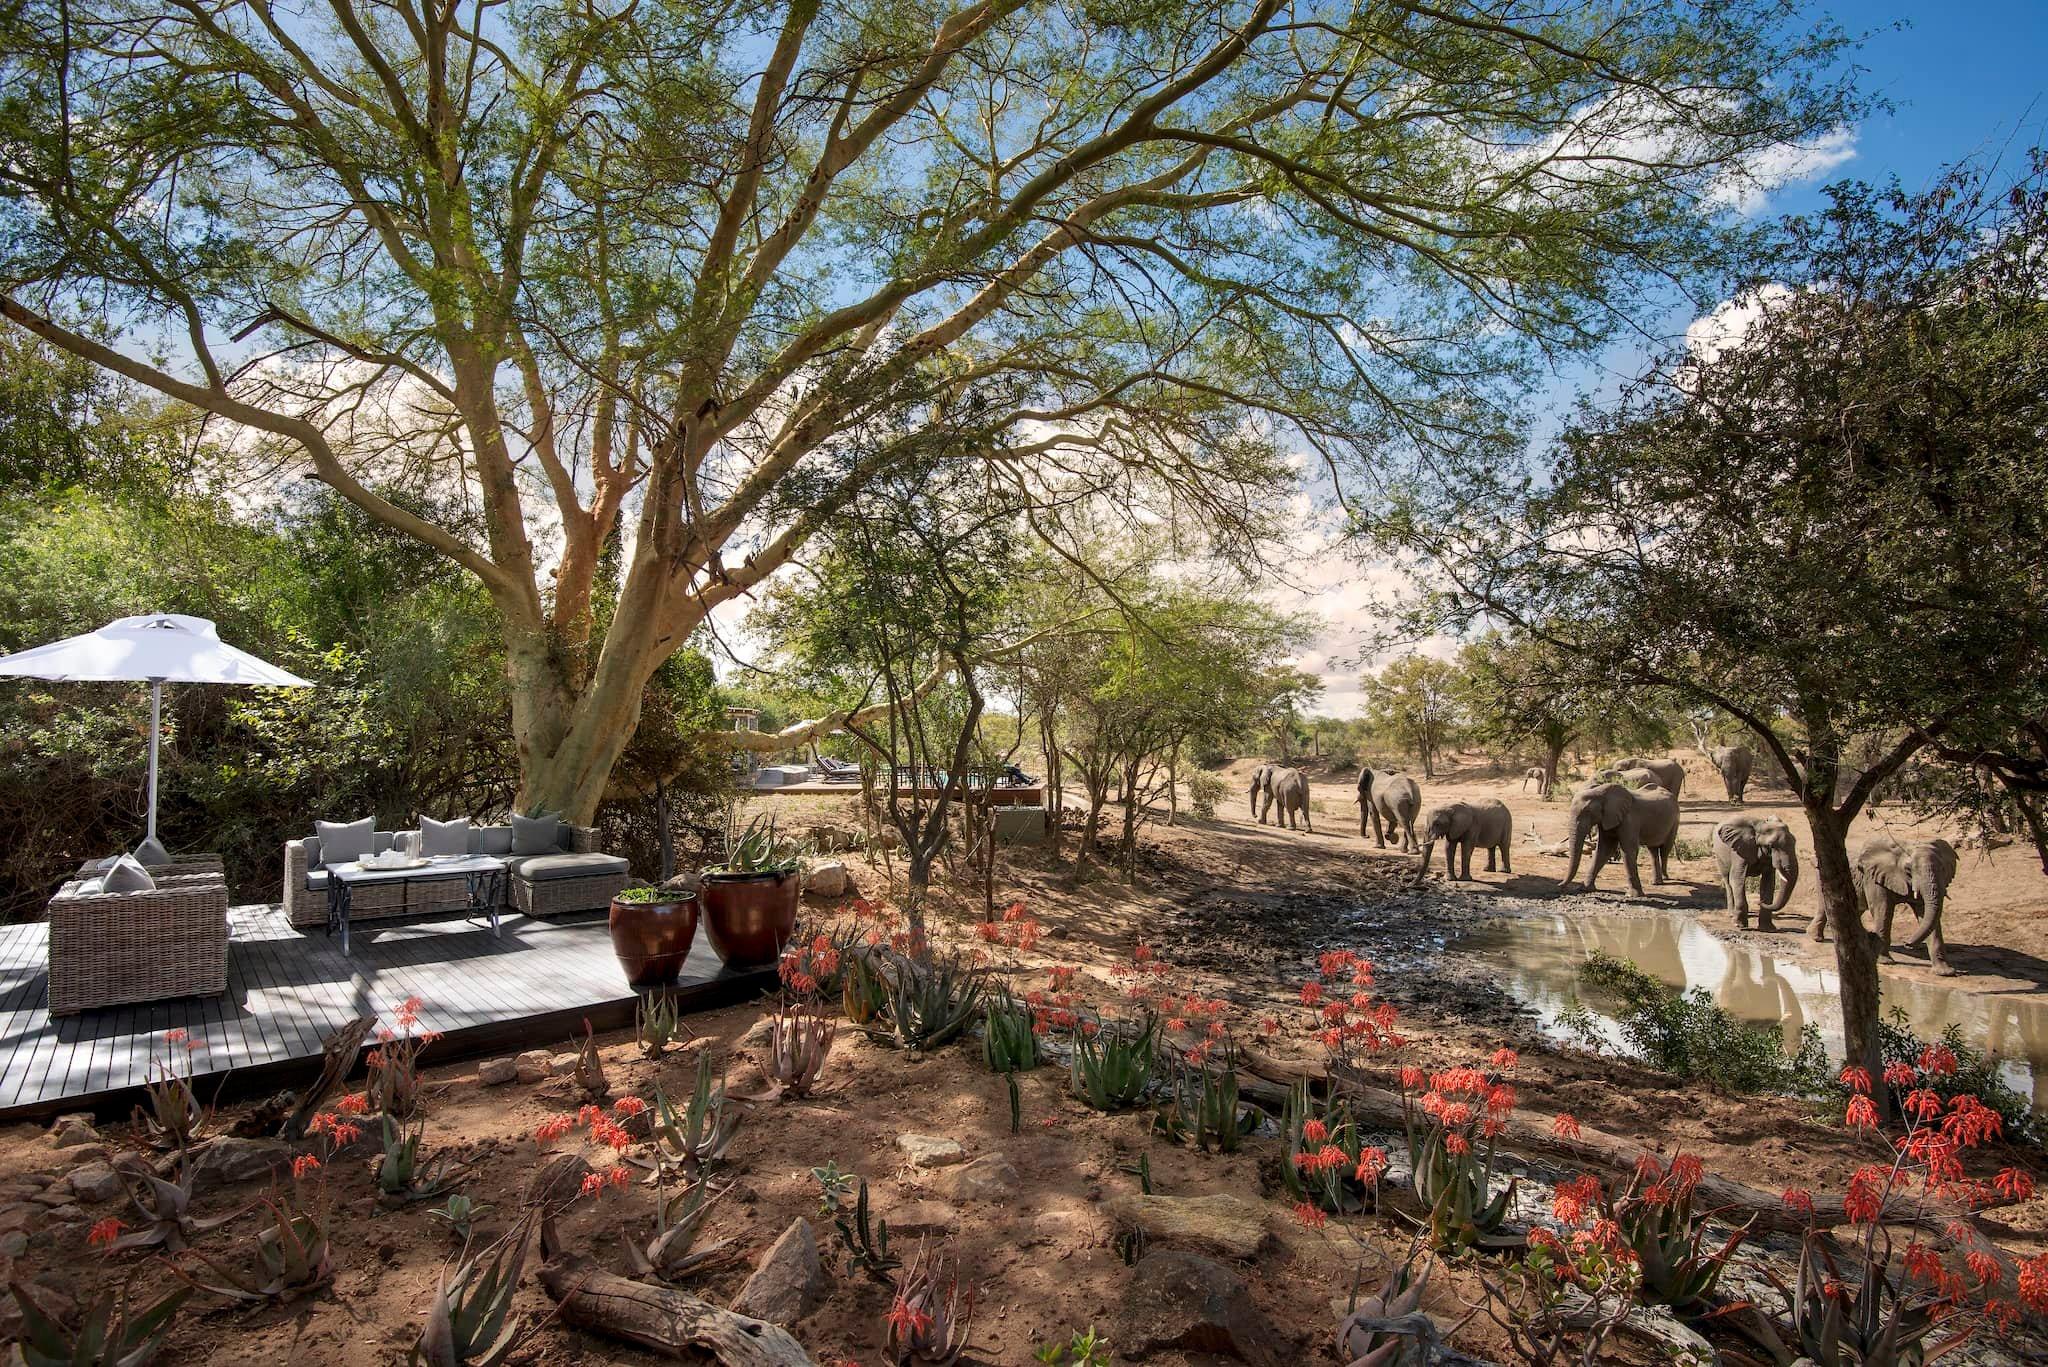 andBeyond-ngala-safari-lodge-exterior-watering-hole-view-01.jpeg